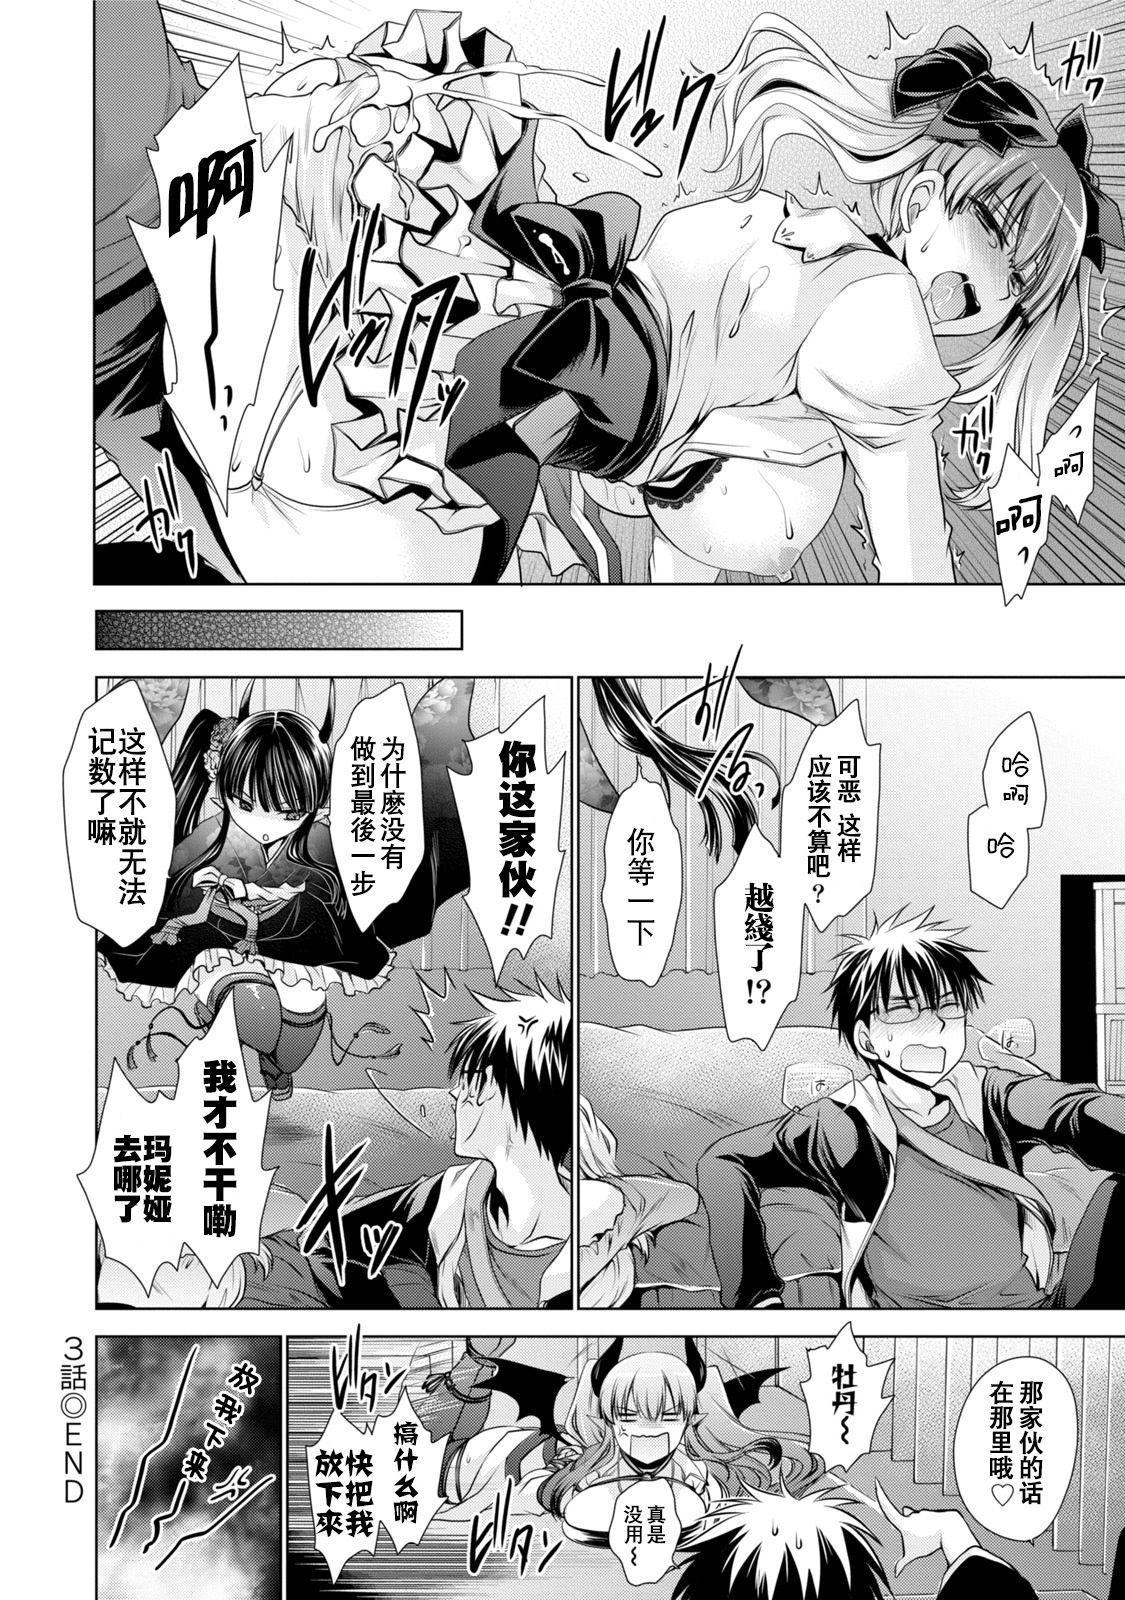 [Shinonome Ryu] Ore to Kanojo to Owaru Sekai - World's end LoveStory 1-5 [Chinese] [爱弹幕汉化组] [Digital] 65